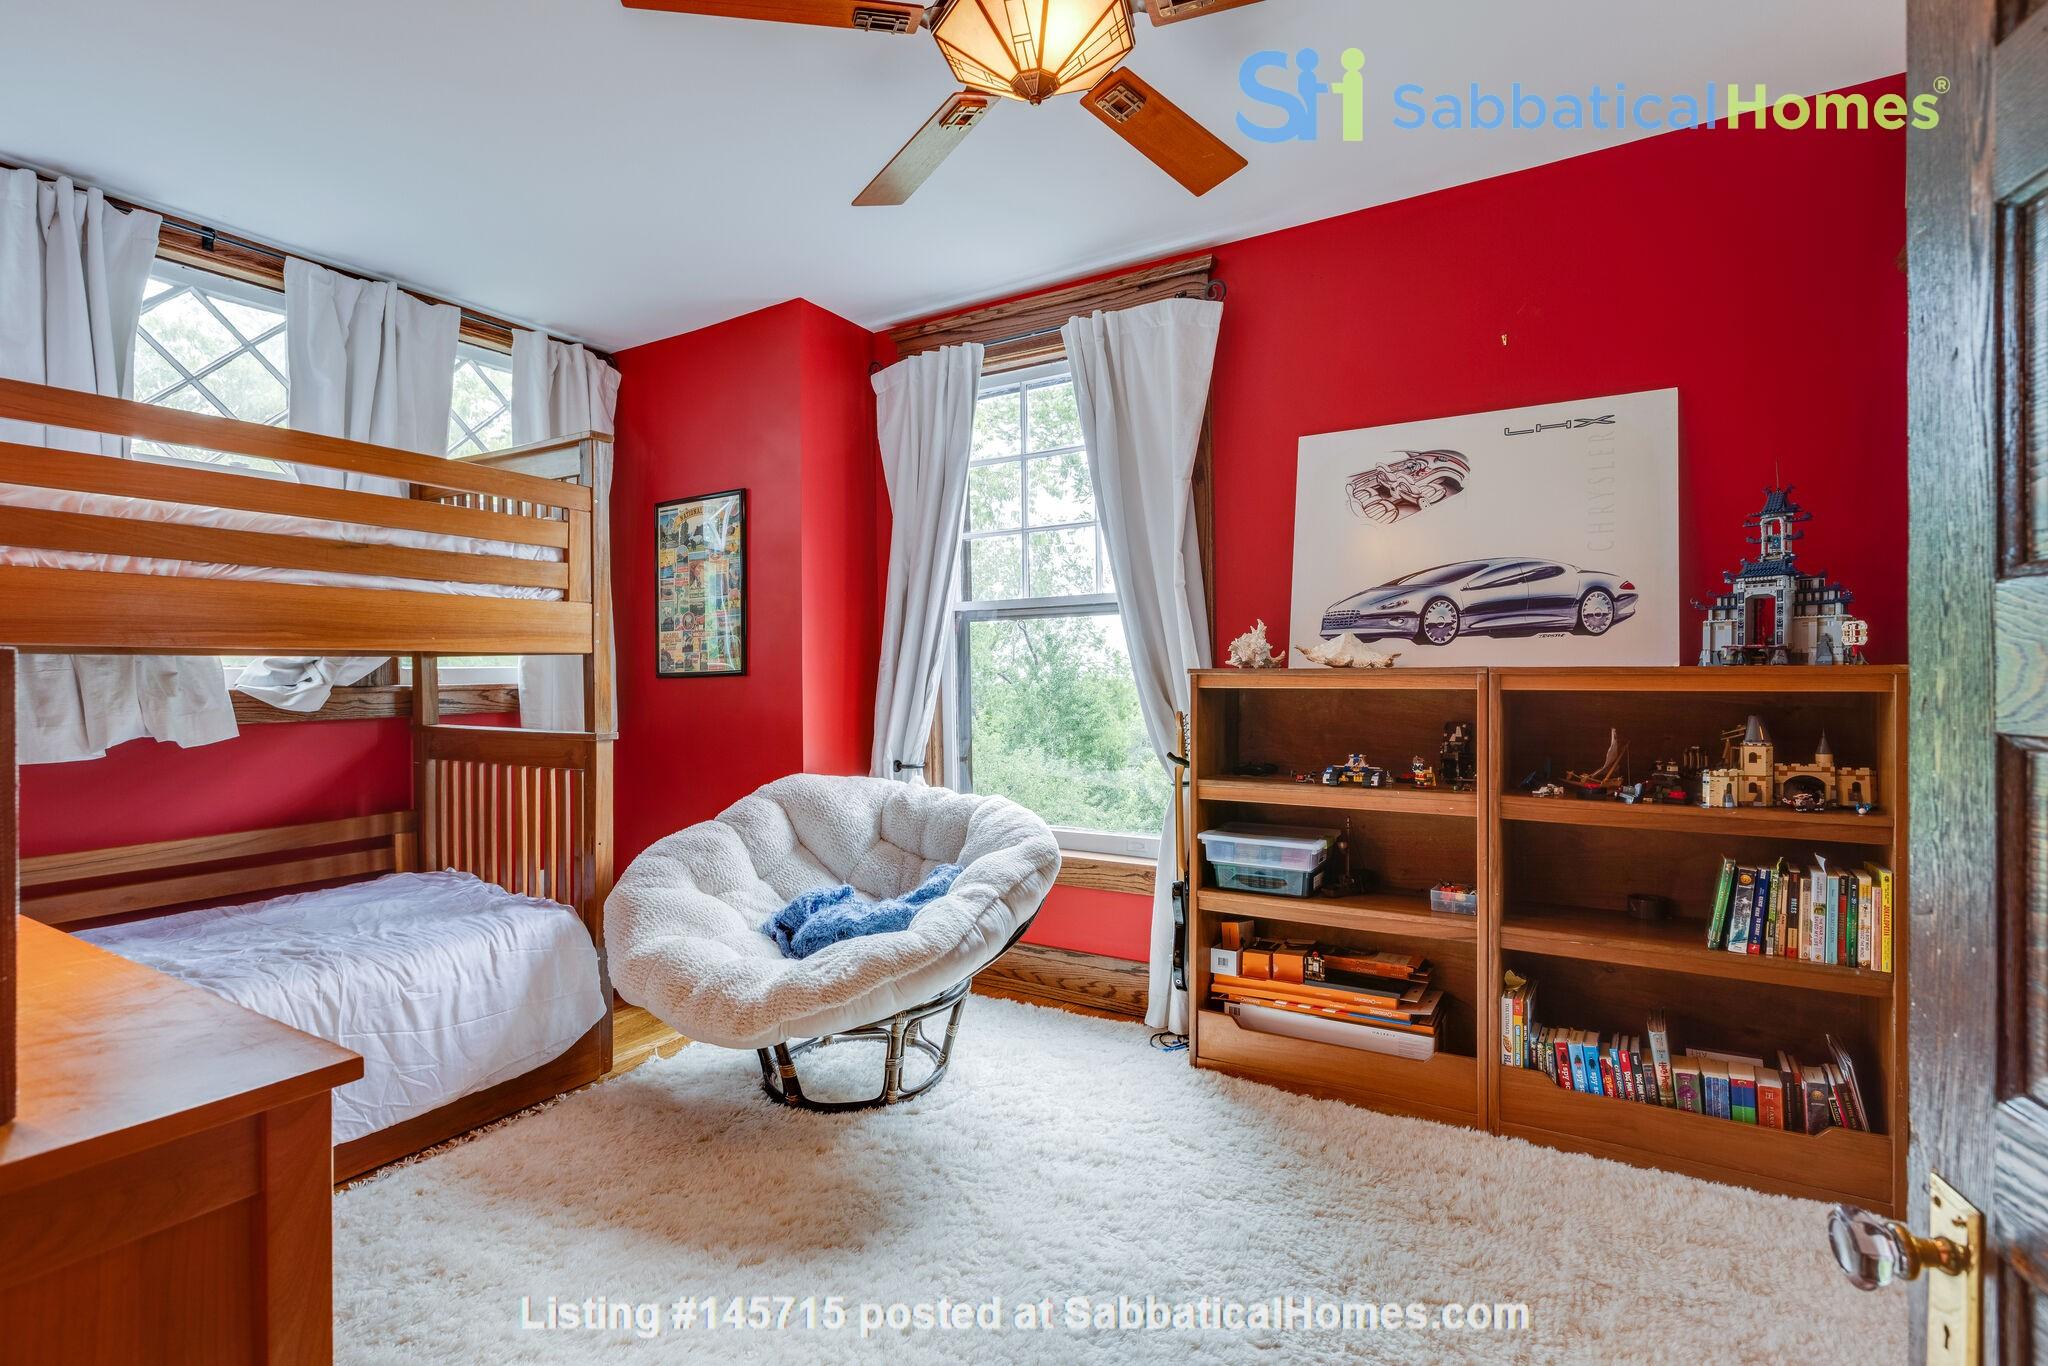 5 BR/3 + 2 BA Historic gem in Belmont-Hillsboro Home Rental in Nashville 9